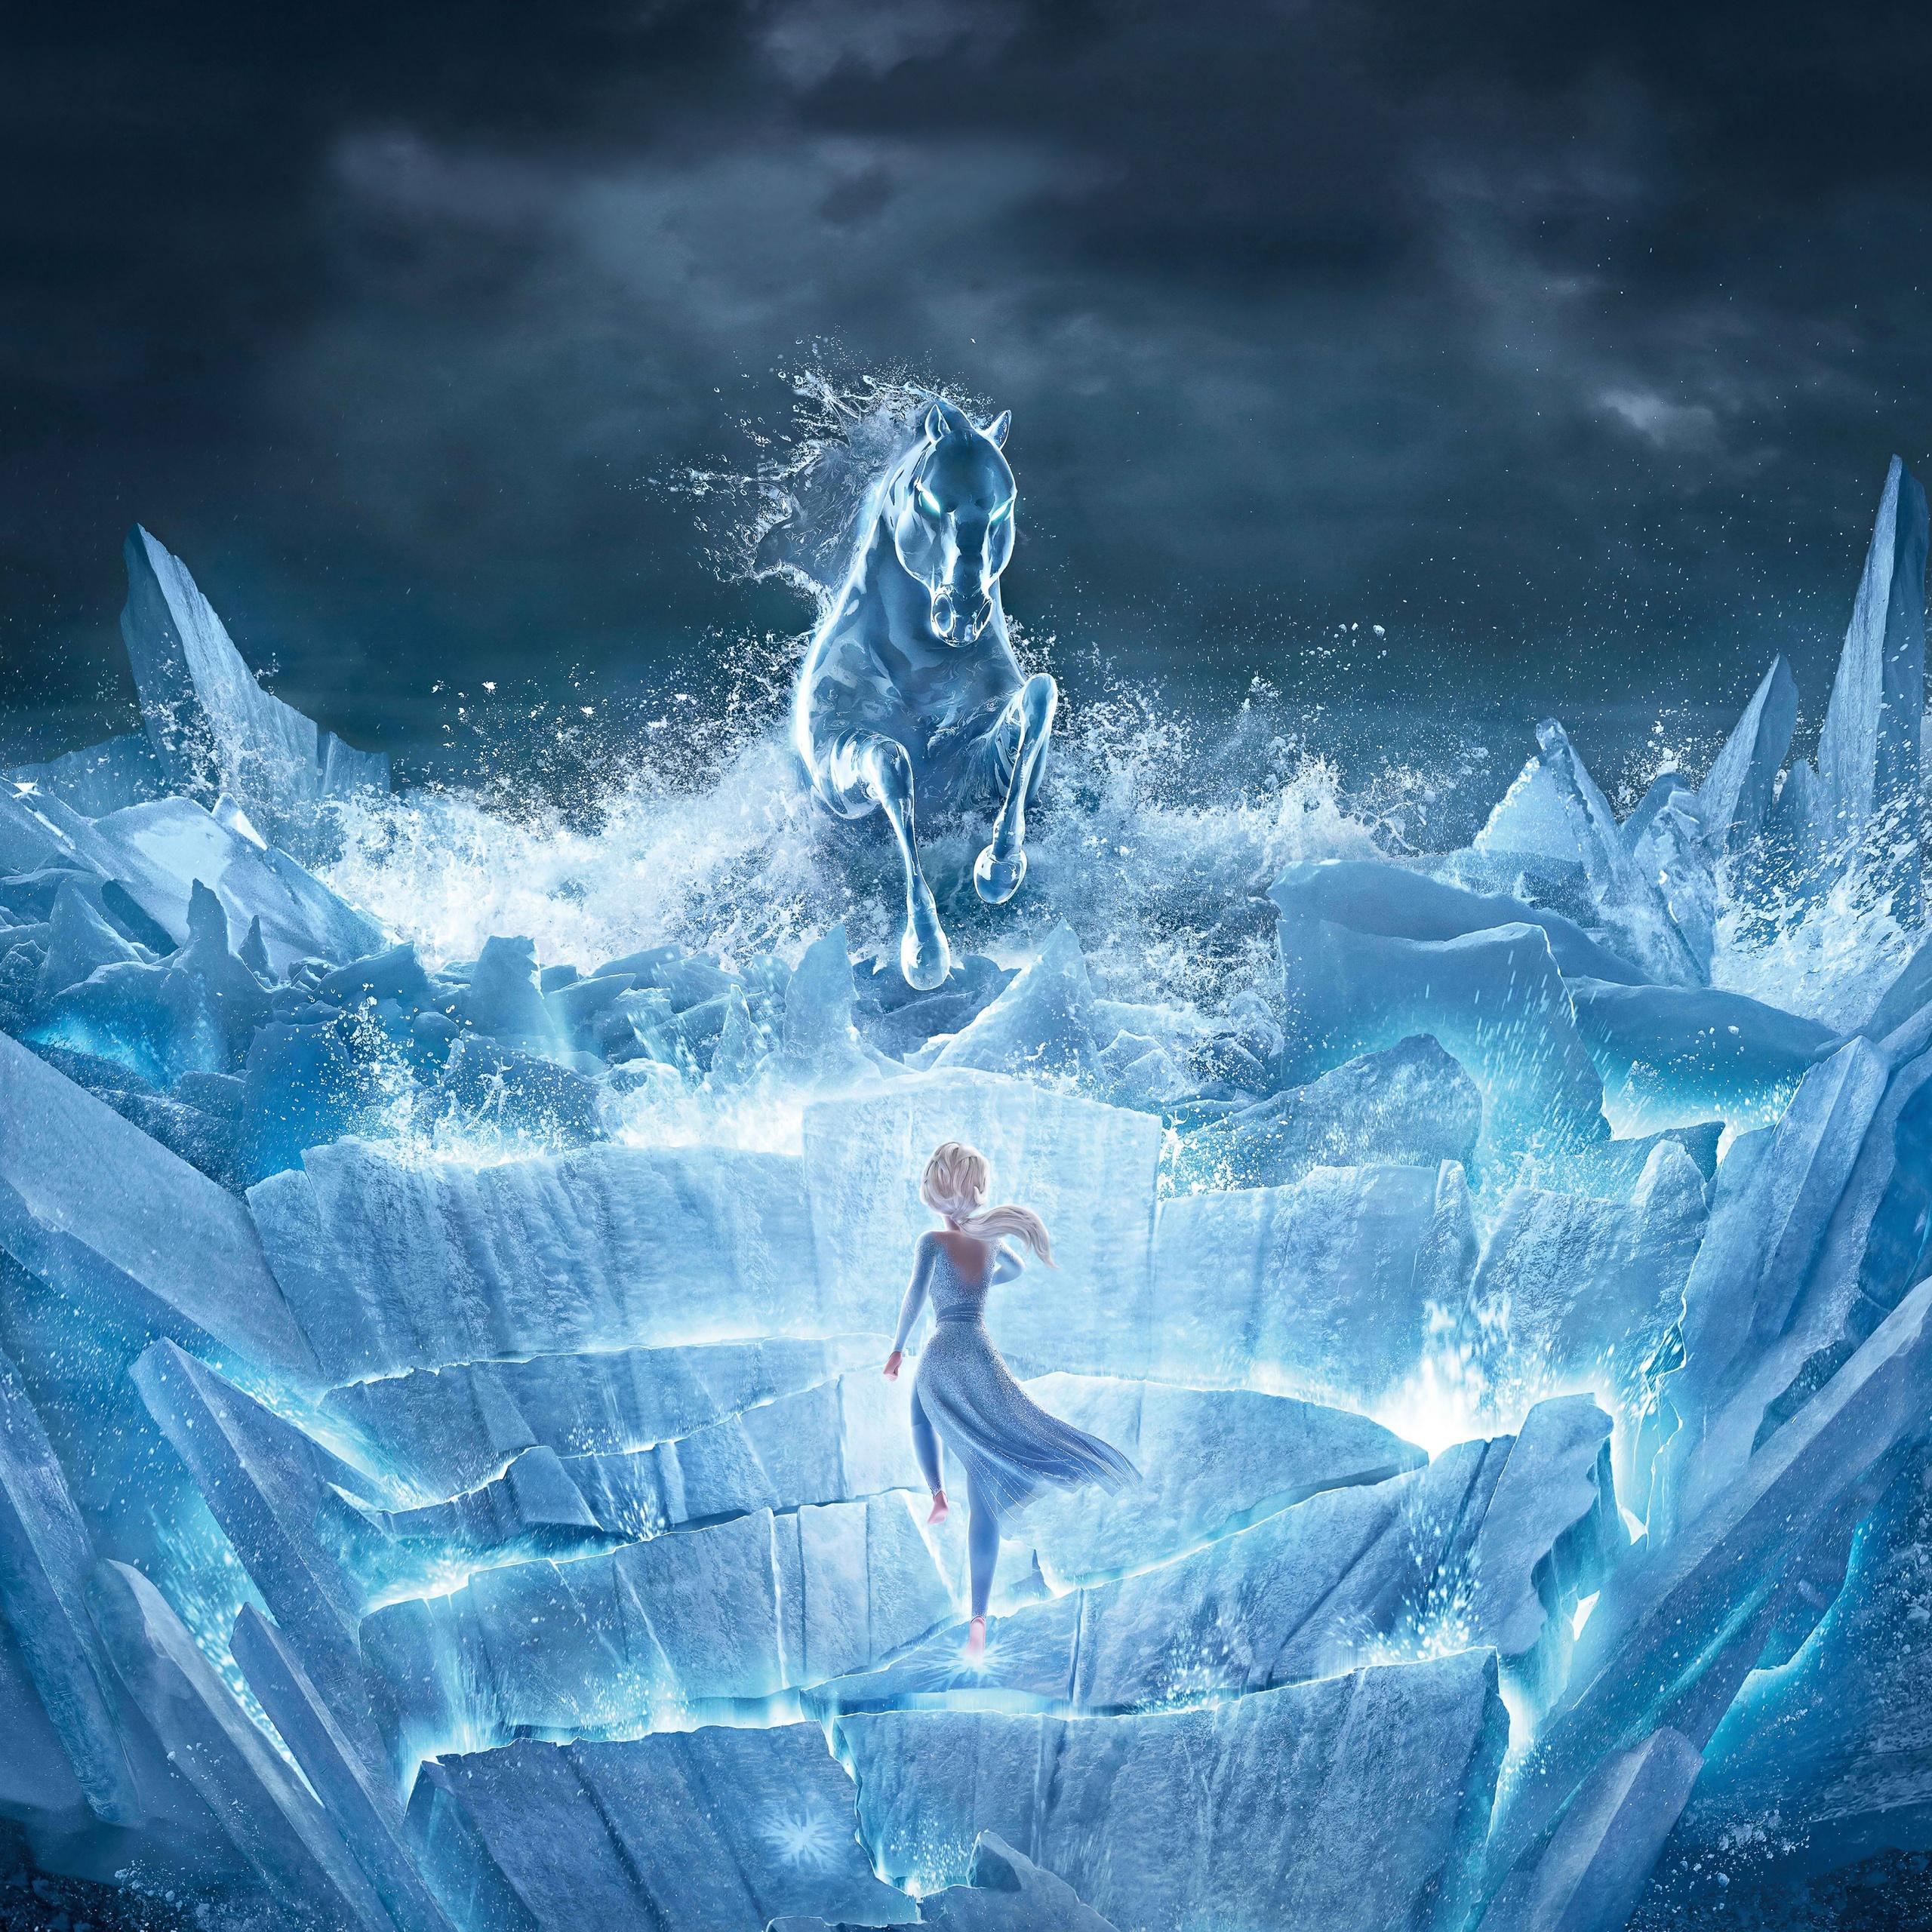 Elsa 4k Wallpaper Frozen 2 The Nokk Water Spirit Animation Movies 670